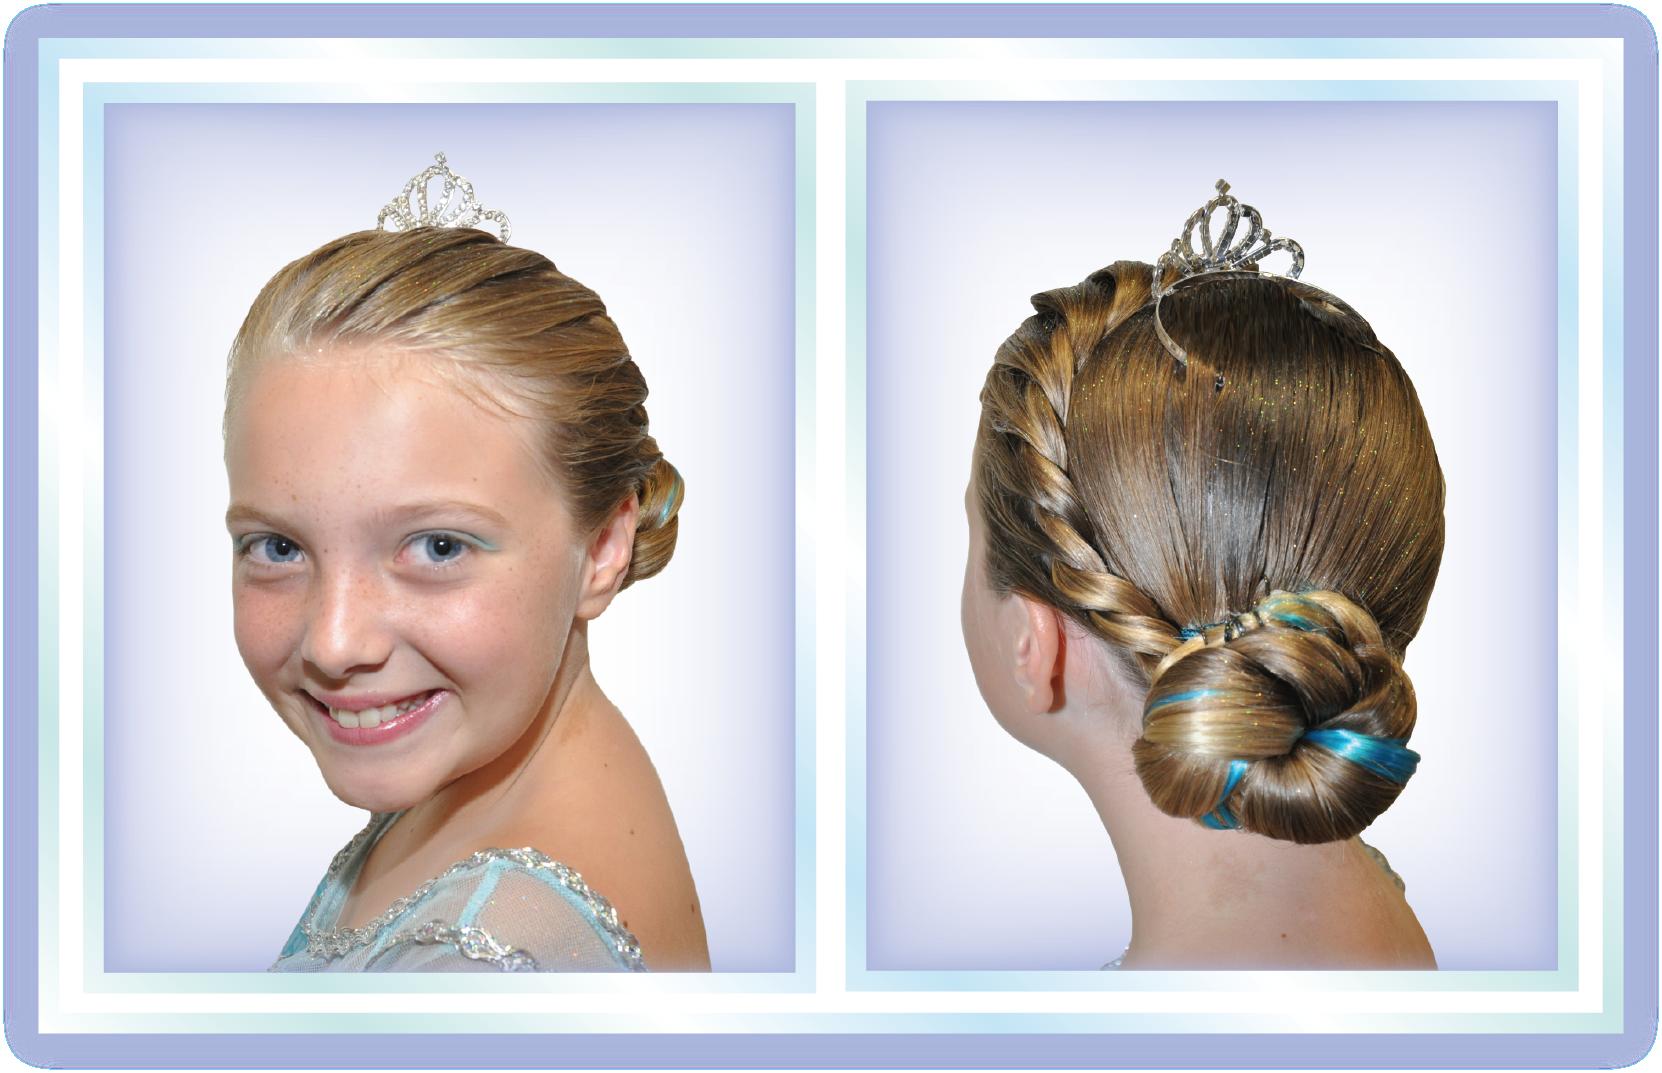 New Anna And Elsa Frozen Styles At Bibbidi Bobbidi Boutique Bibbidi Bobbidi Boutique Bibbidi Bobbidi Boutique Hairstyles Elsa Frozen